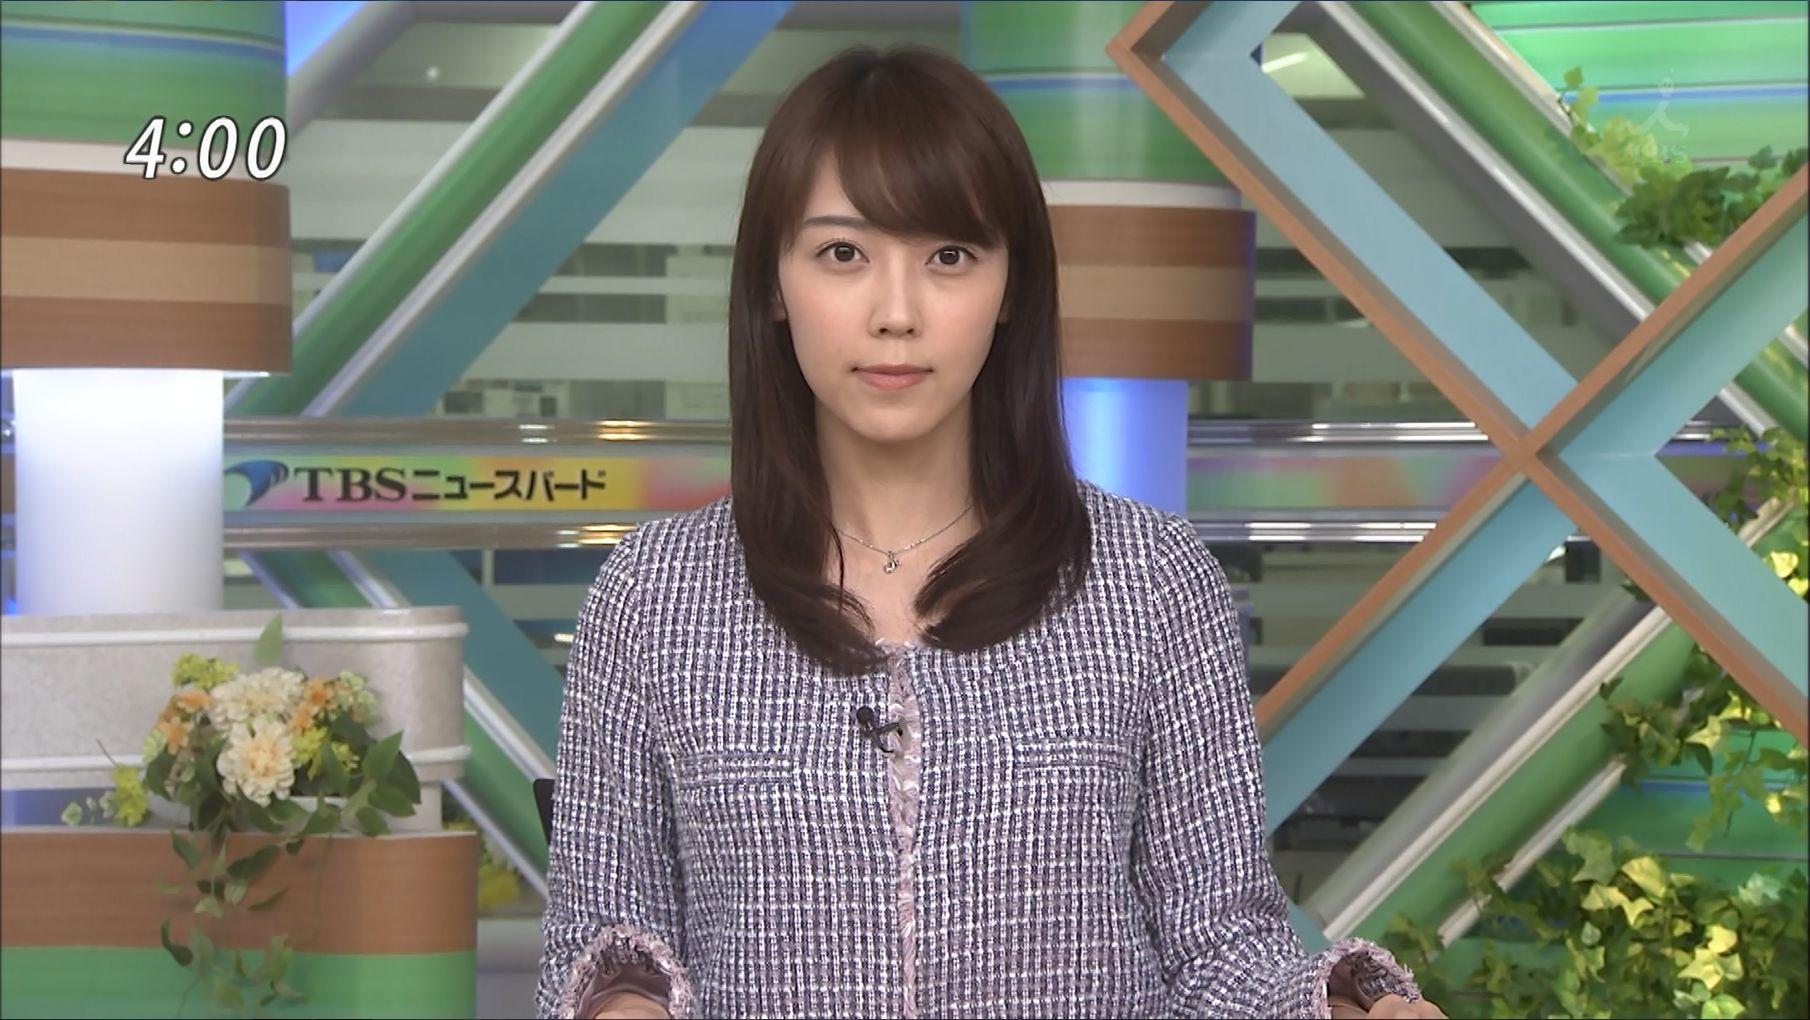 「上野愛奈」の画像検索結果